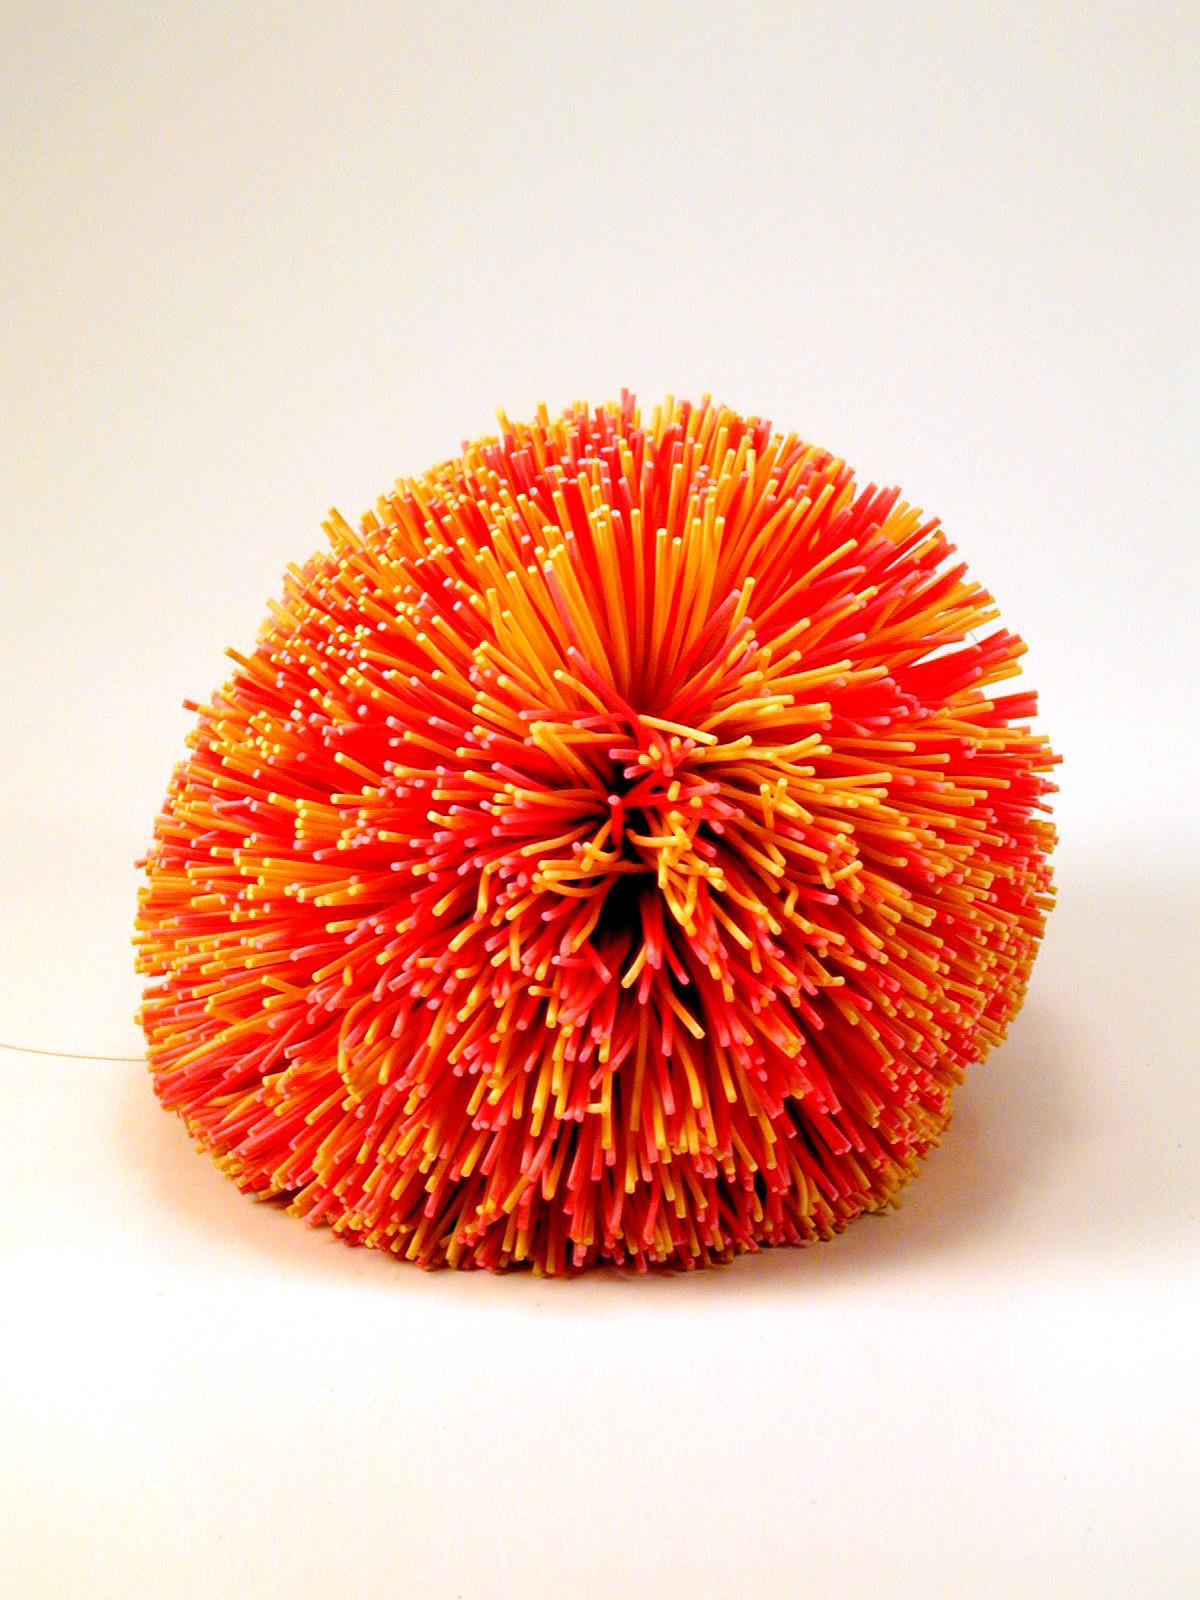 Squishy Koosh Ball : Koosh ball